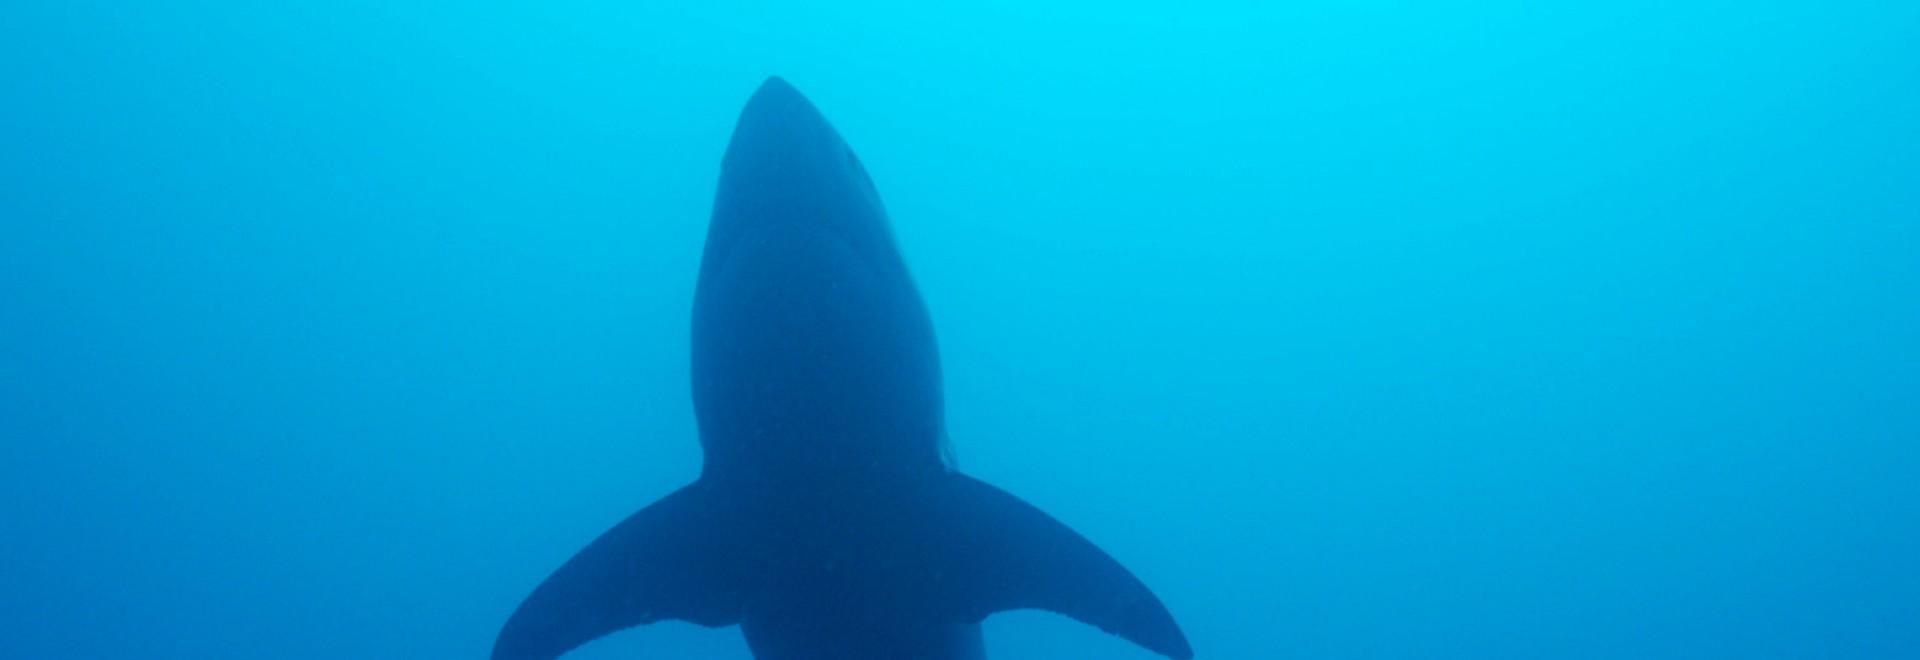 L'isola degli squali fantasma